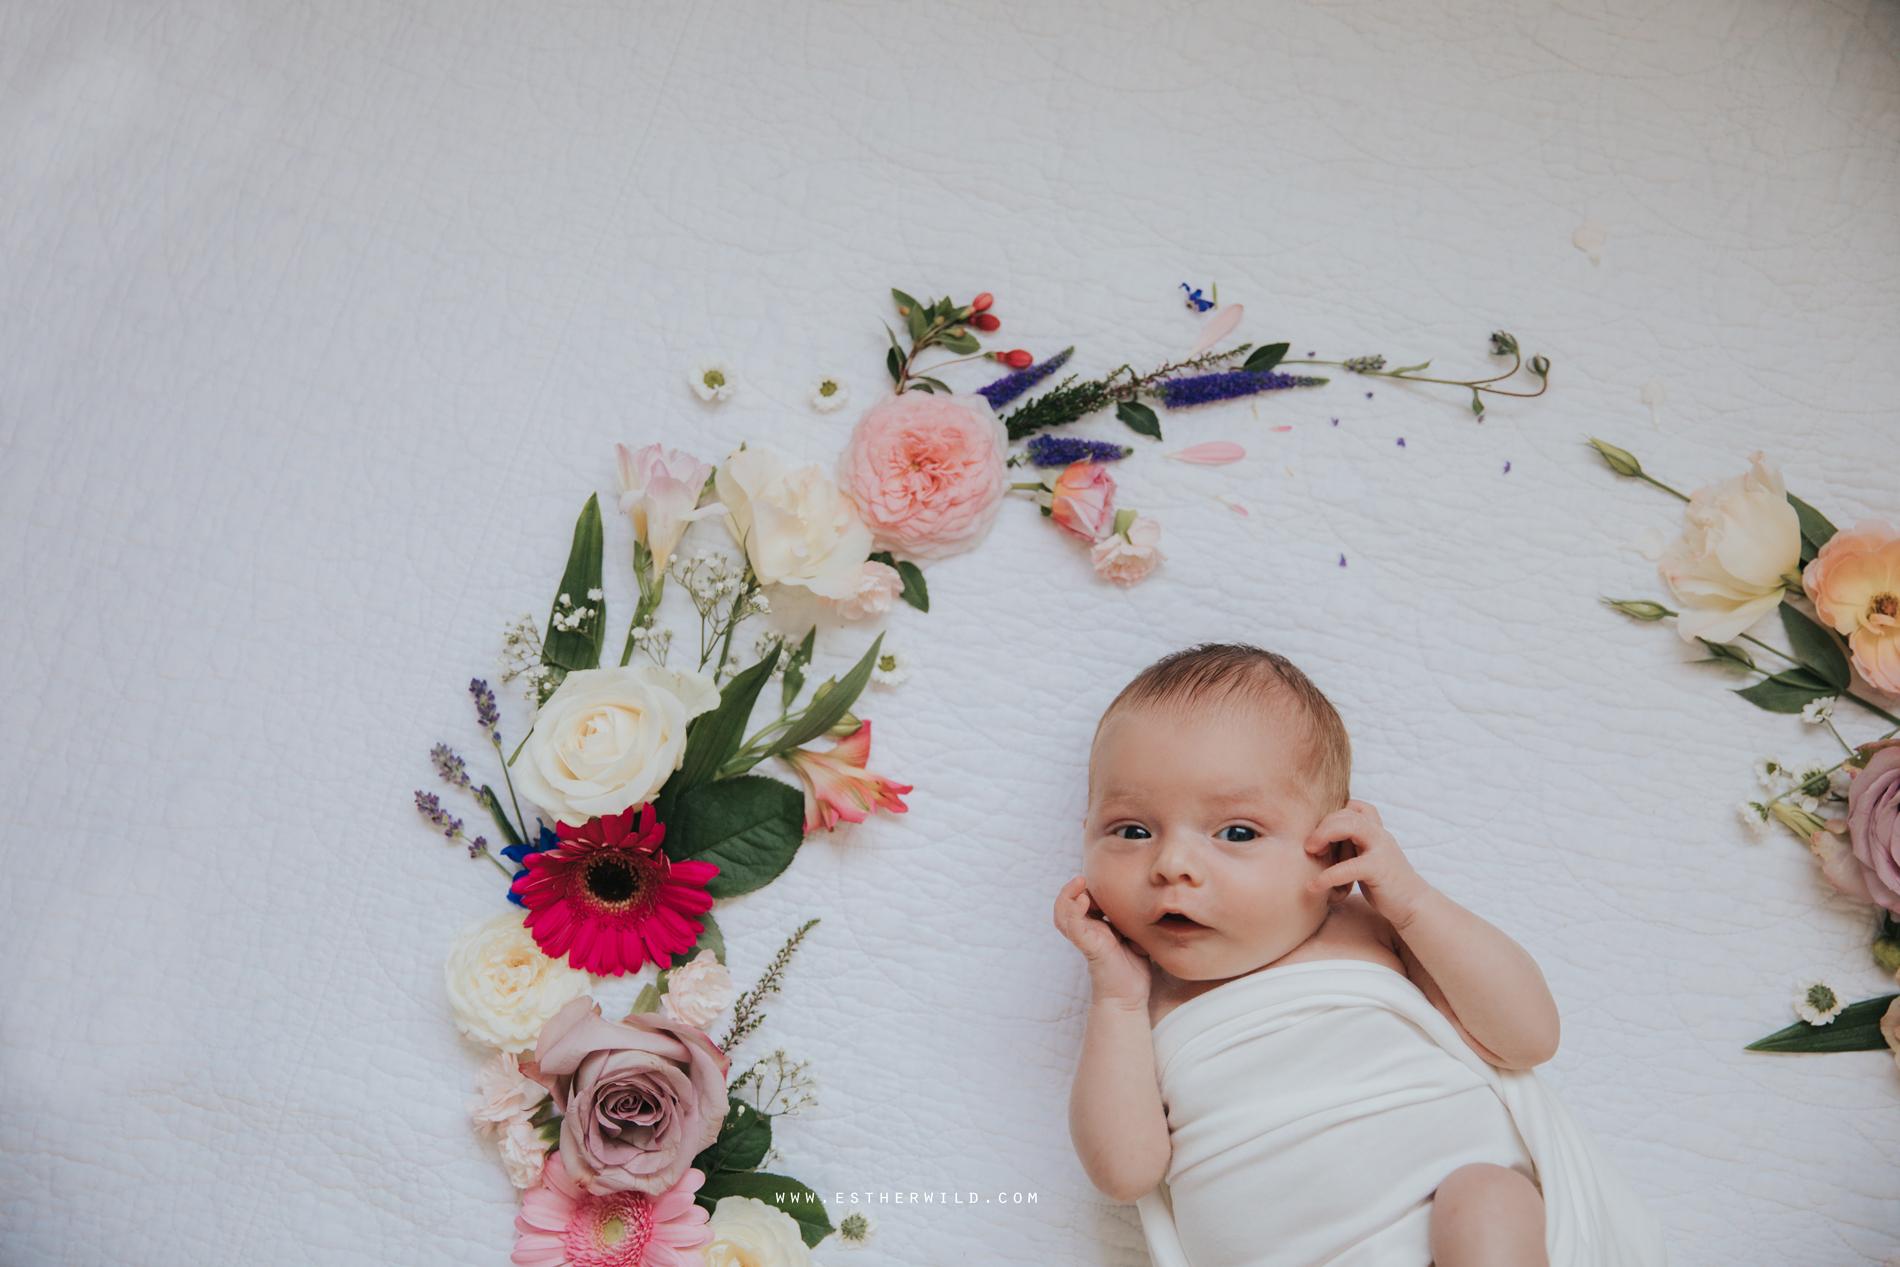 Newborn_Family_Photographer_Home_Norfolk_3R8A3835.jpg